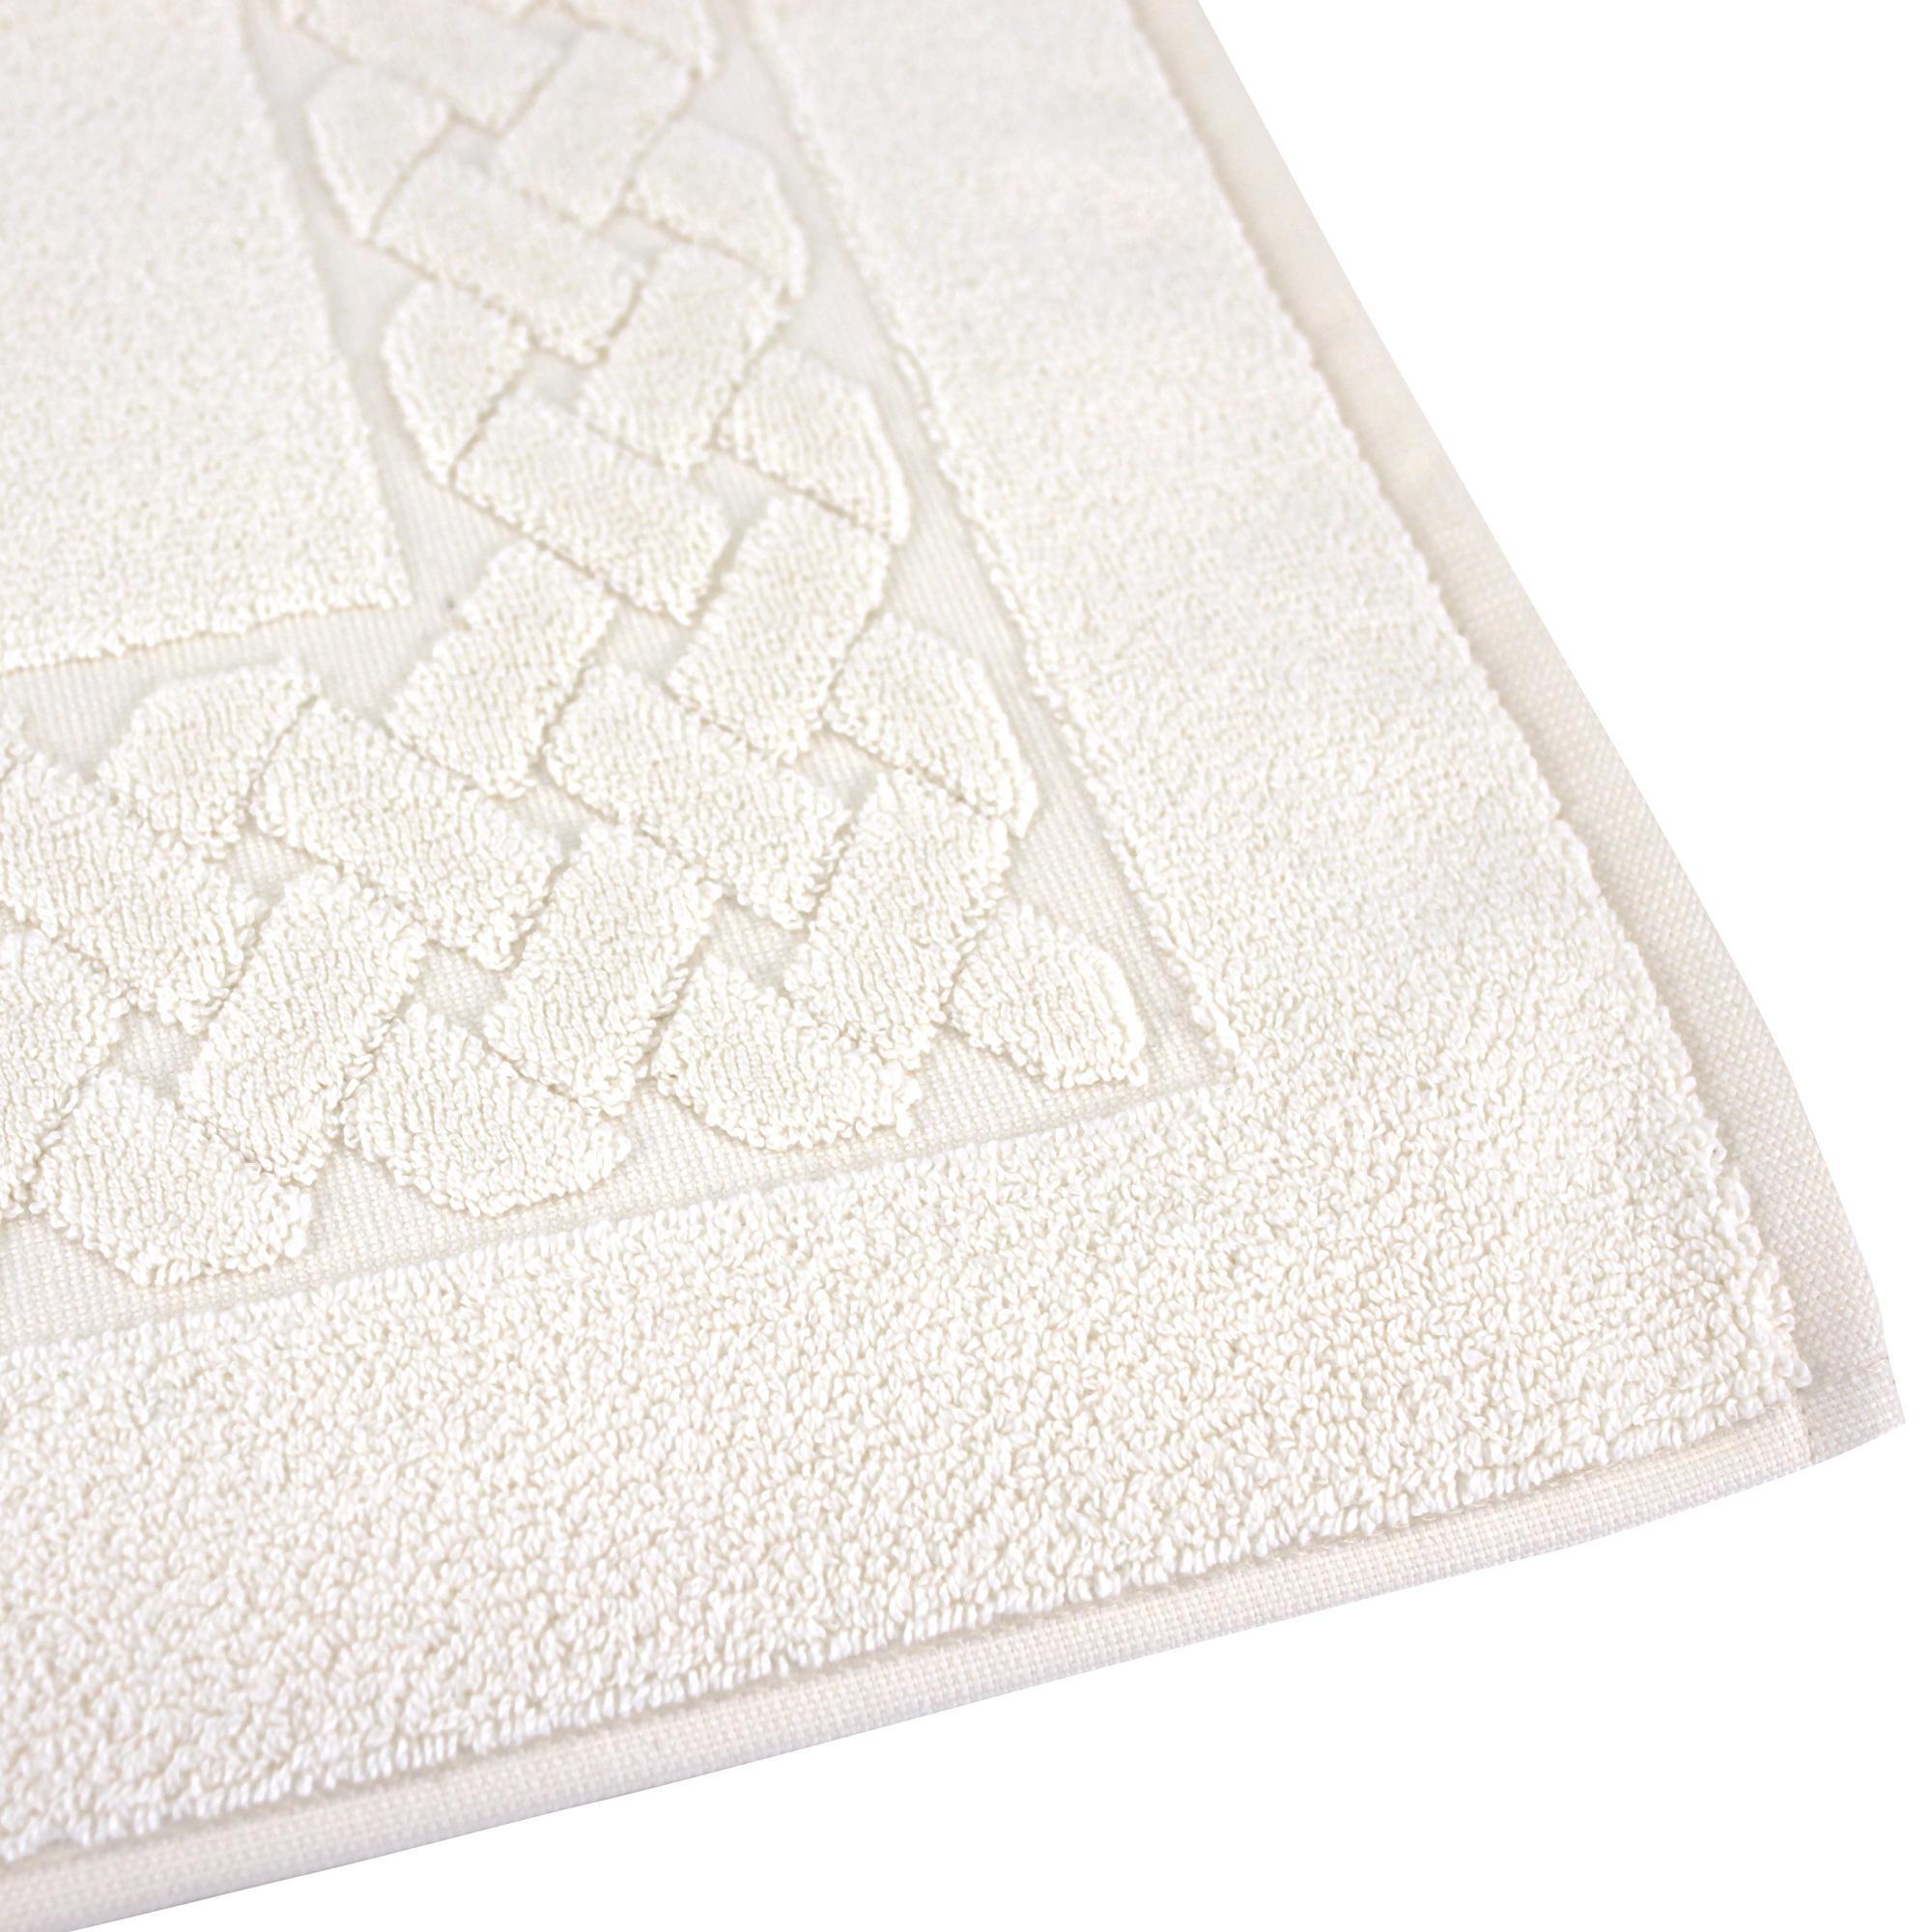 tapis de bain 50x80 royal cresent blanc cr me 850g m2 ebay. Black Bedroom Furniture Sets. Home Design Ideas